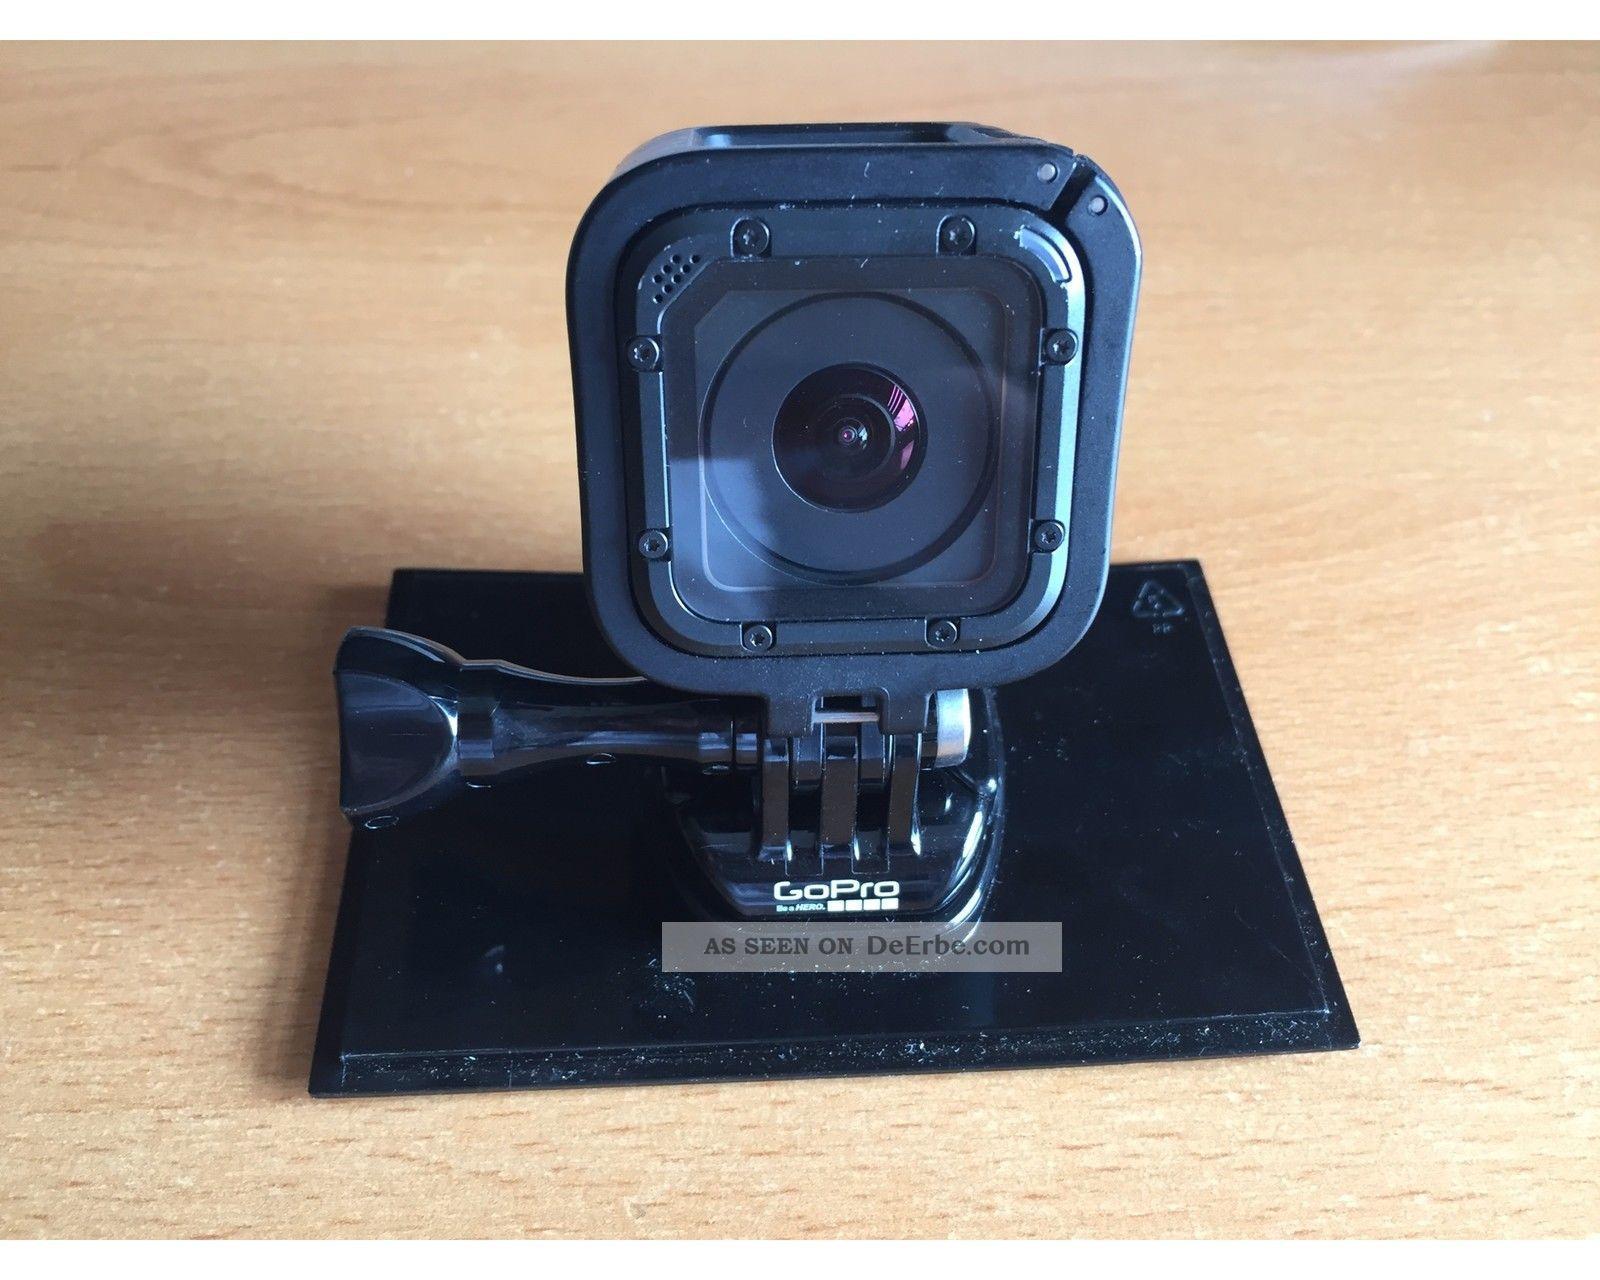 Go Pro (gopro) Hero4 Session Kamera Film & Bildprojektion Bild